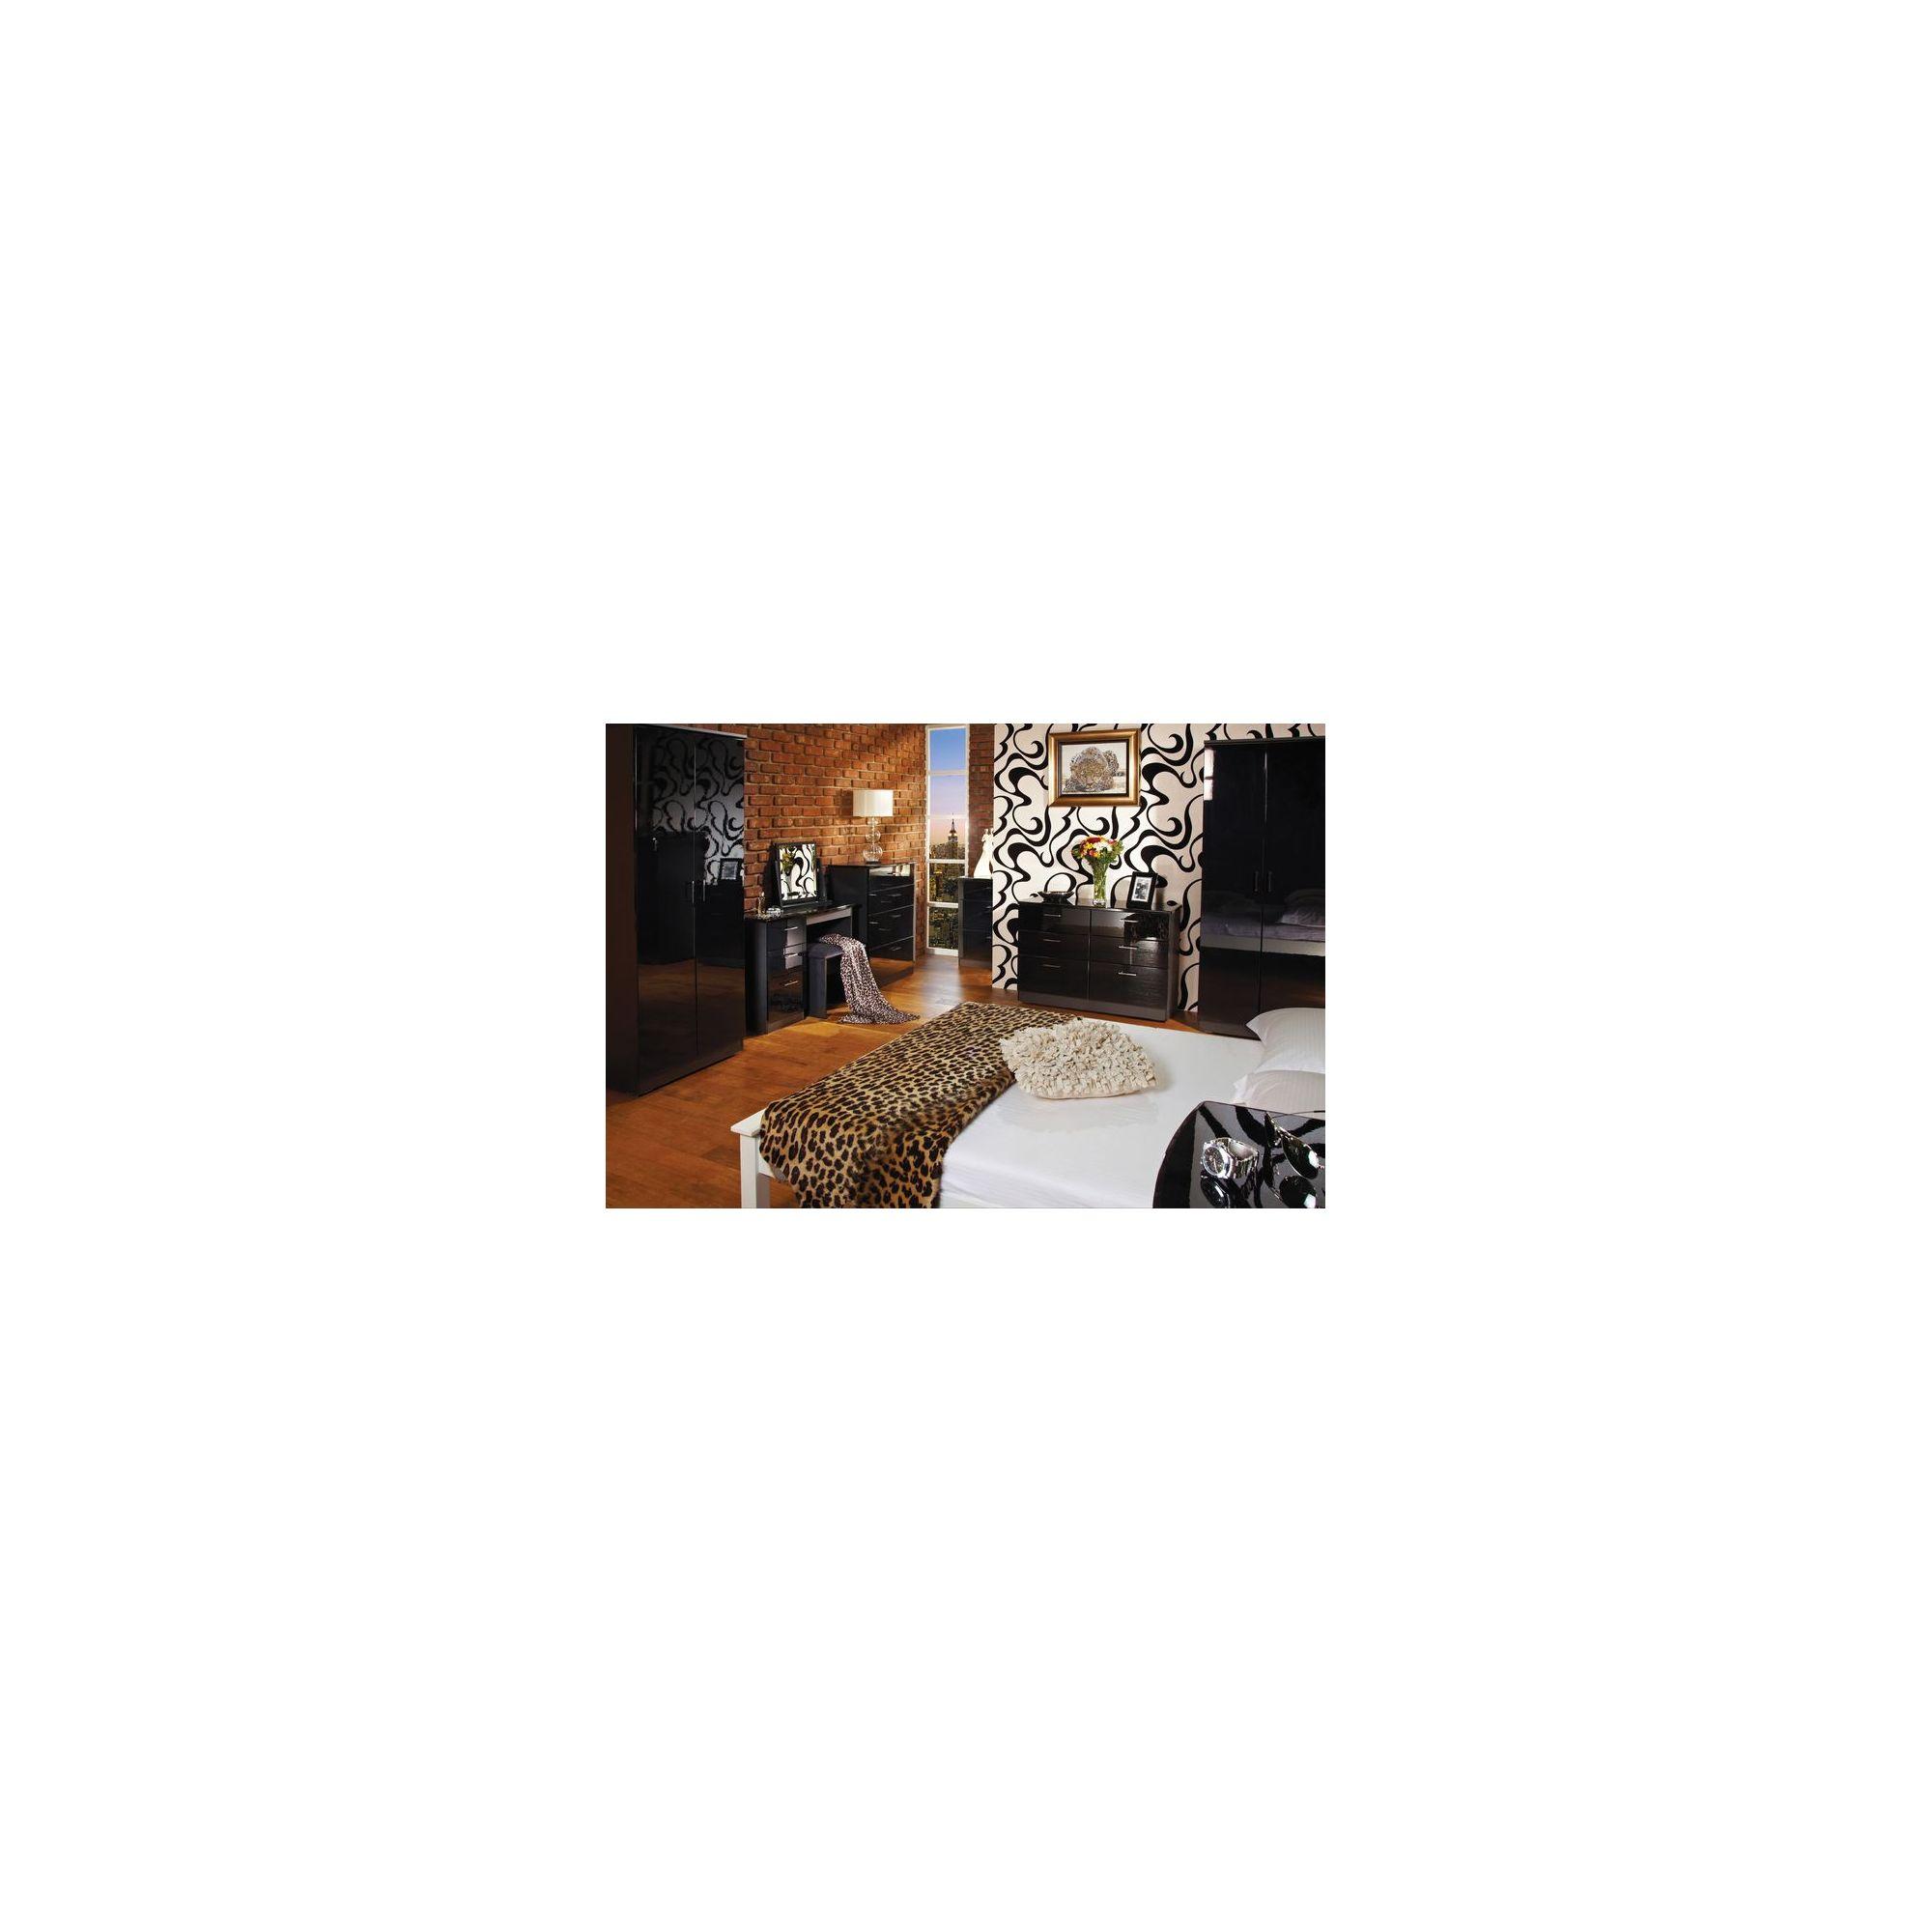 Welcome Furniture Mayfair Tall Plain Wardrobe - Aubergine - Ebony - Cream at Tesco Direct